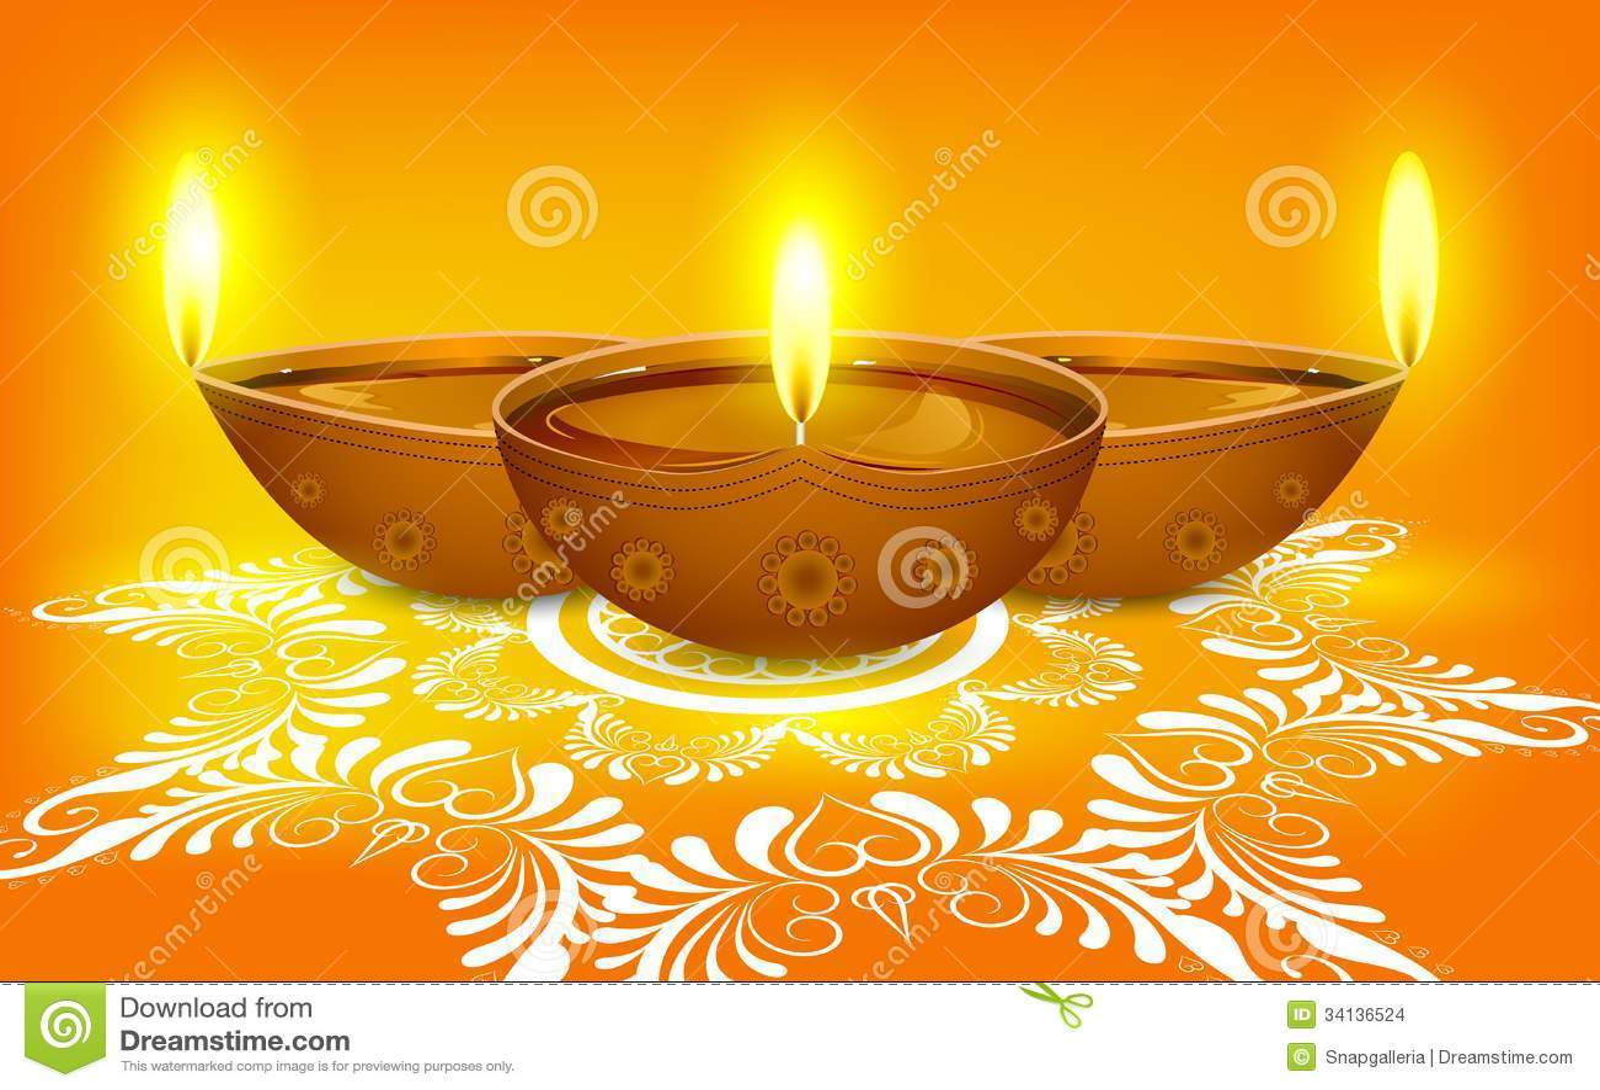 Diya on Rangoli for Diwali